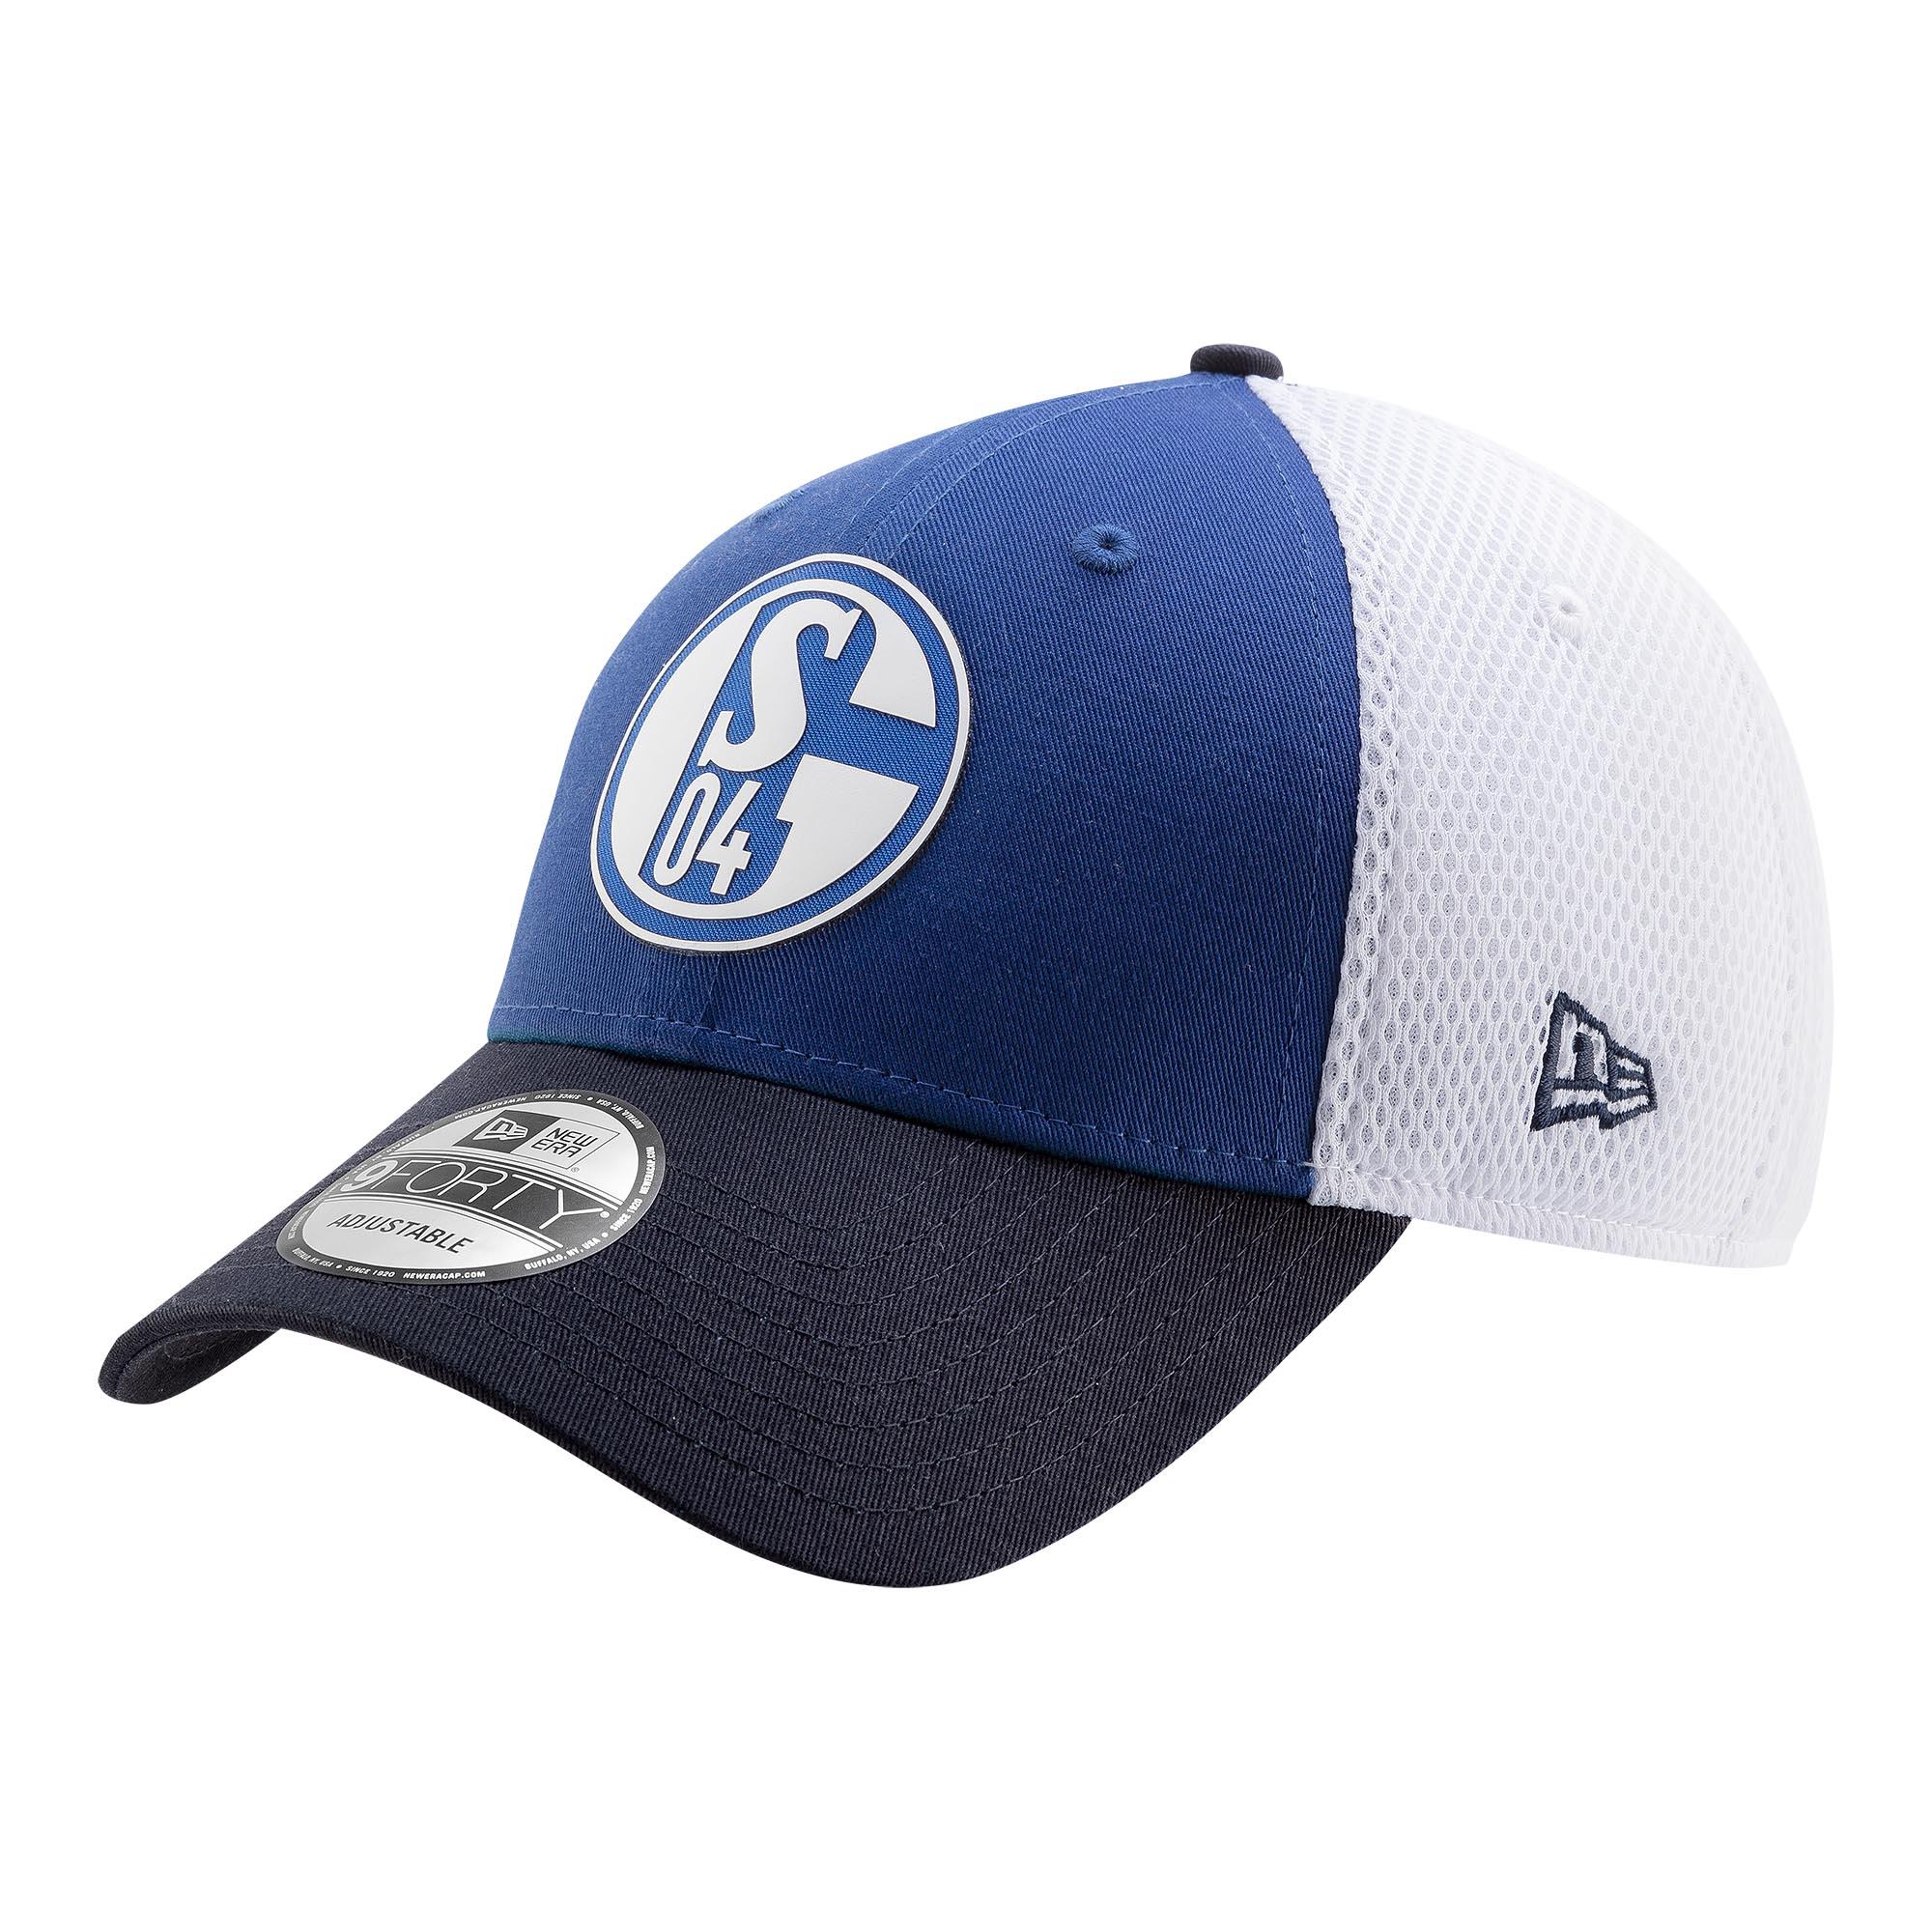 VfL Wolfsburg New ERA Cap Kappe 9FORTY gr/ün